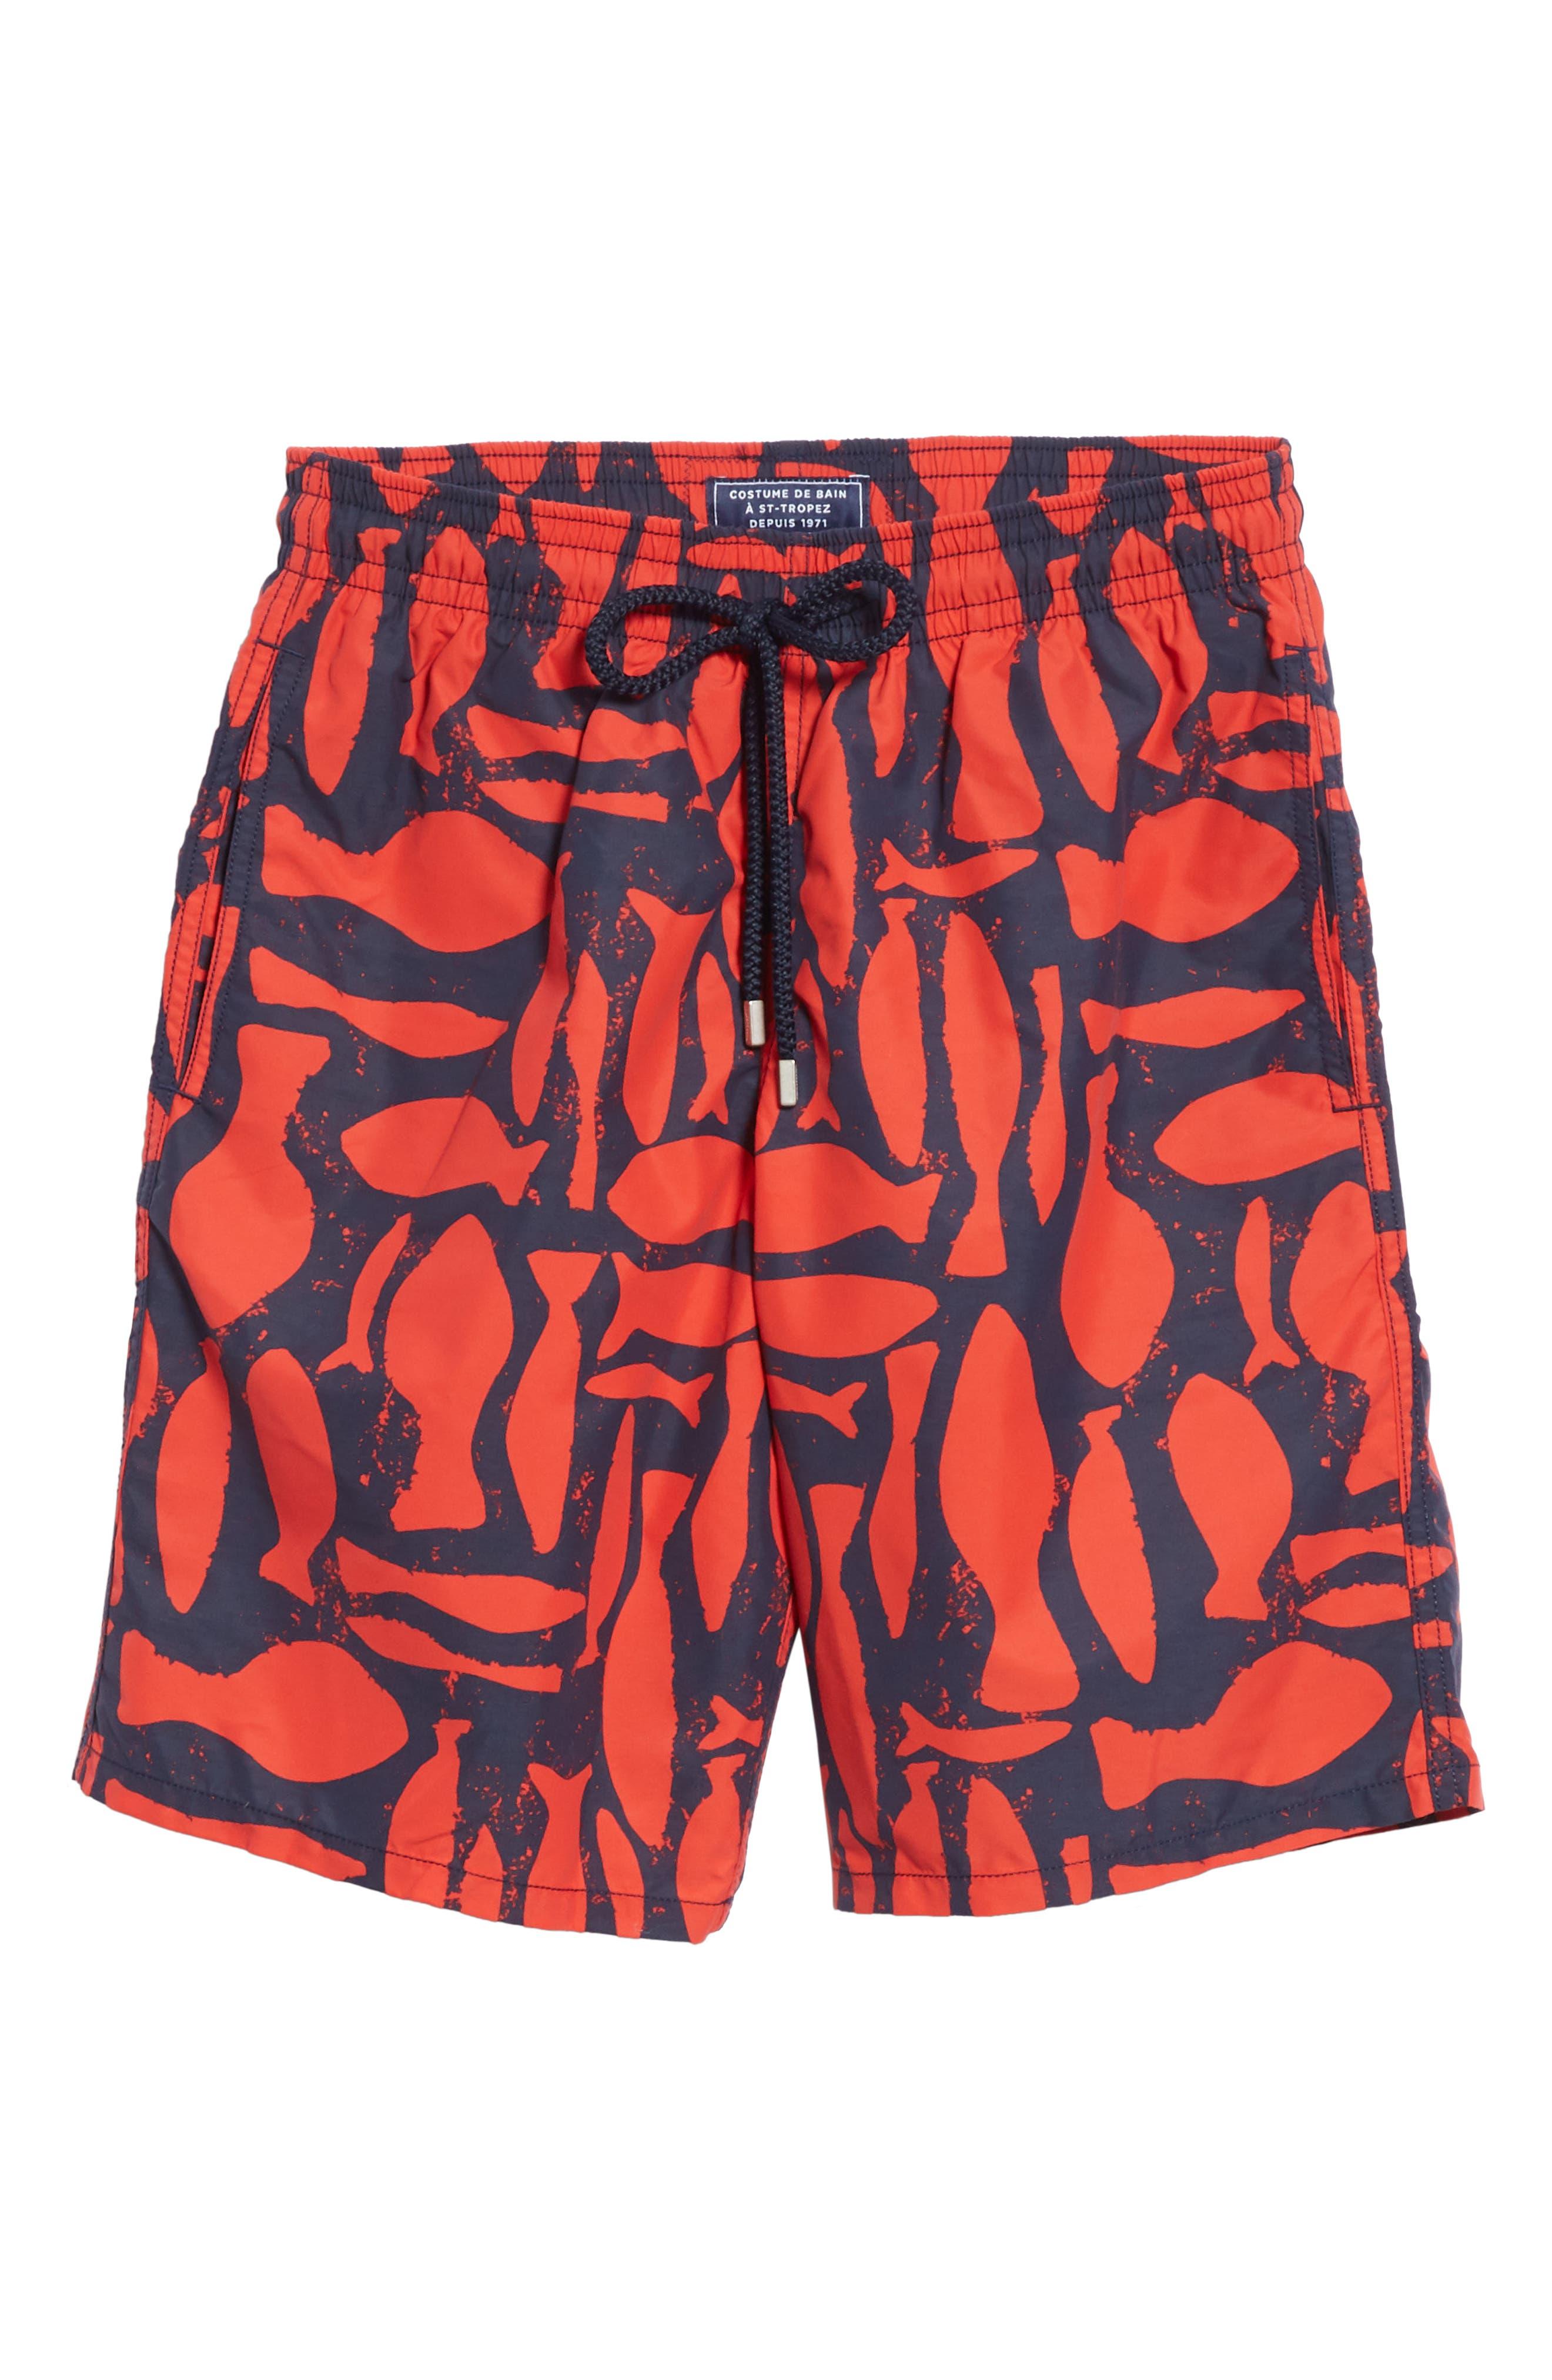 Silex Fish Print Swim Trunks,                             Alternate thumbnail 6, color,                             POPPY RED